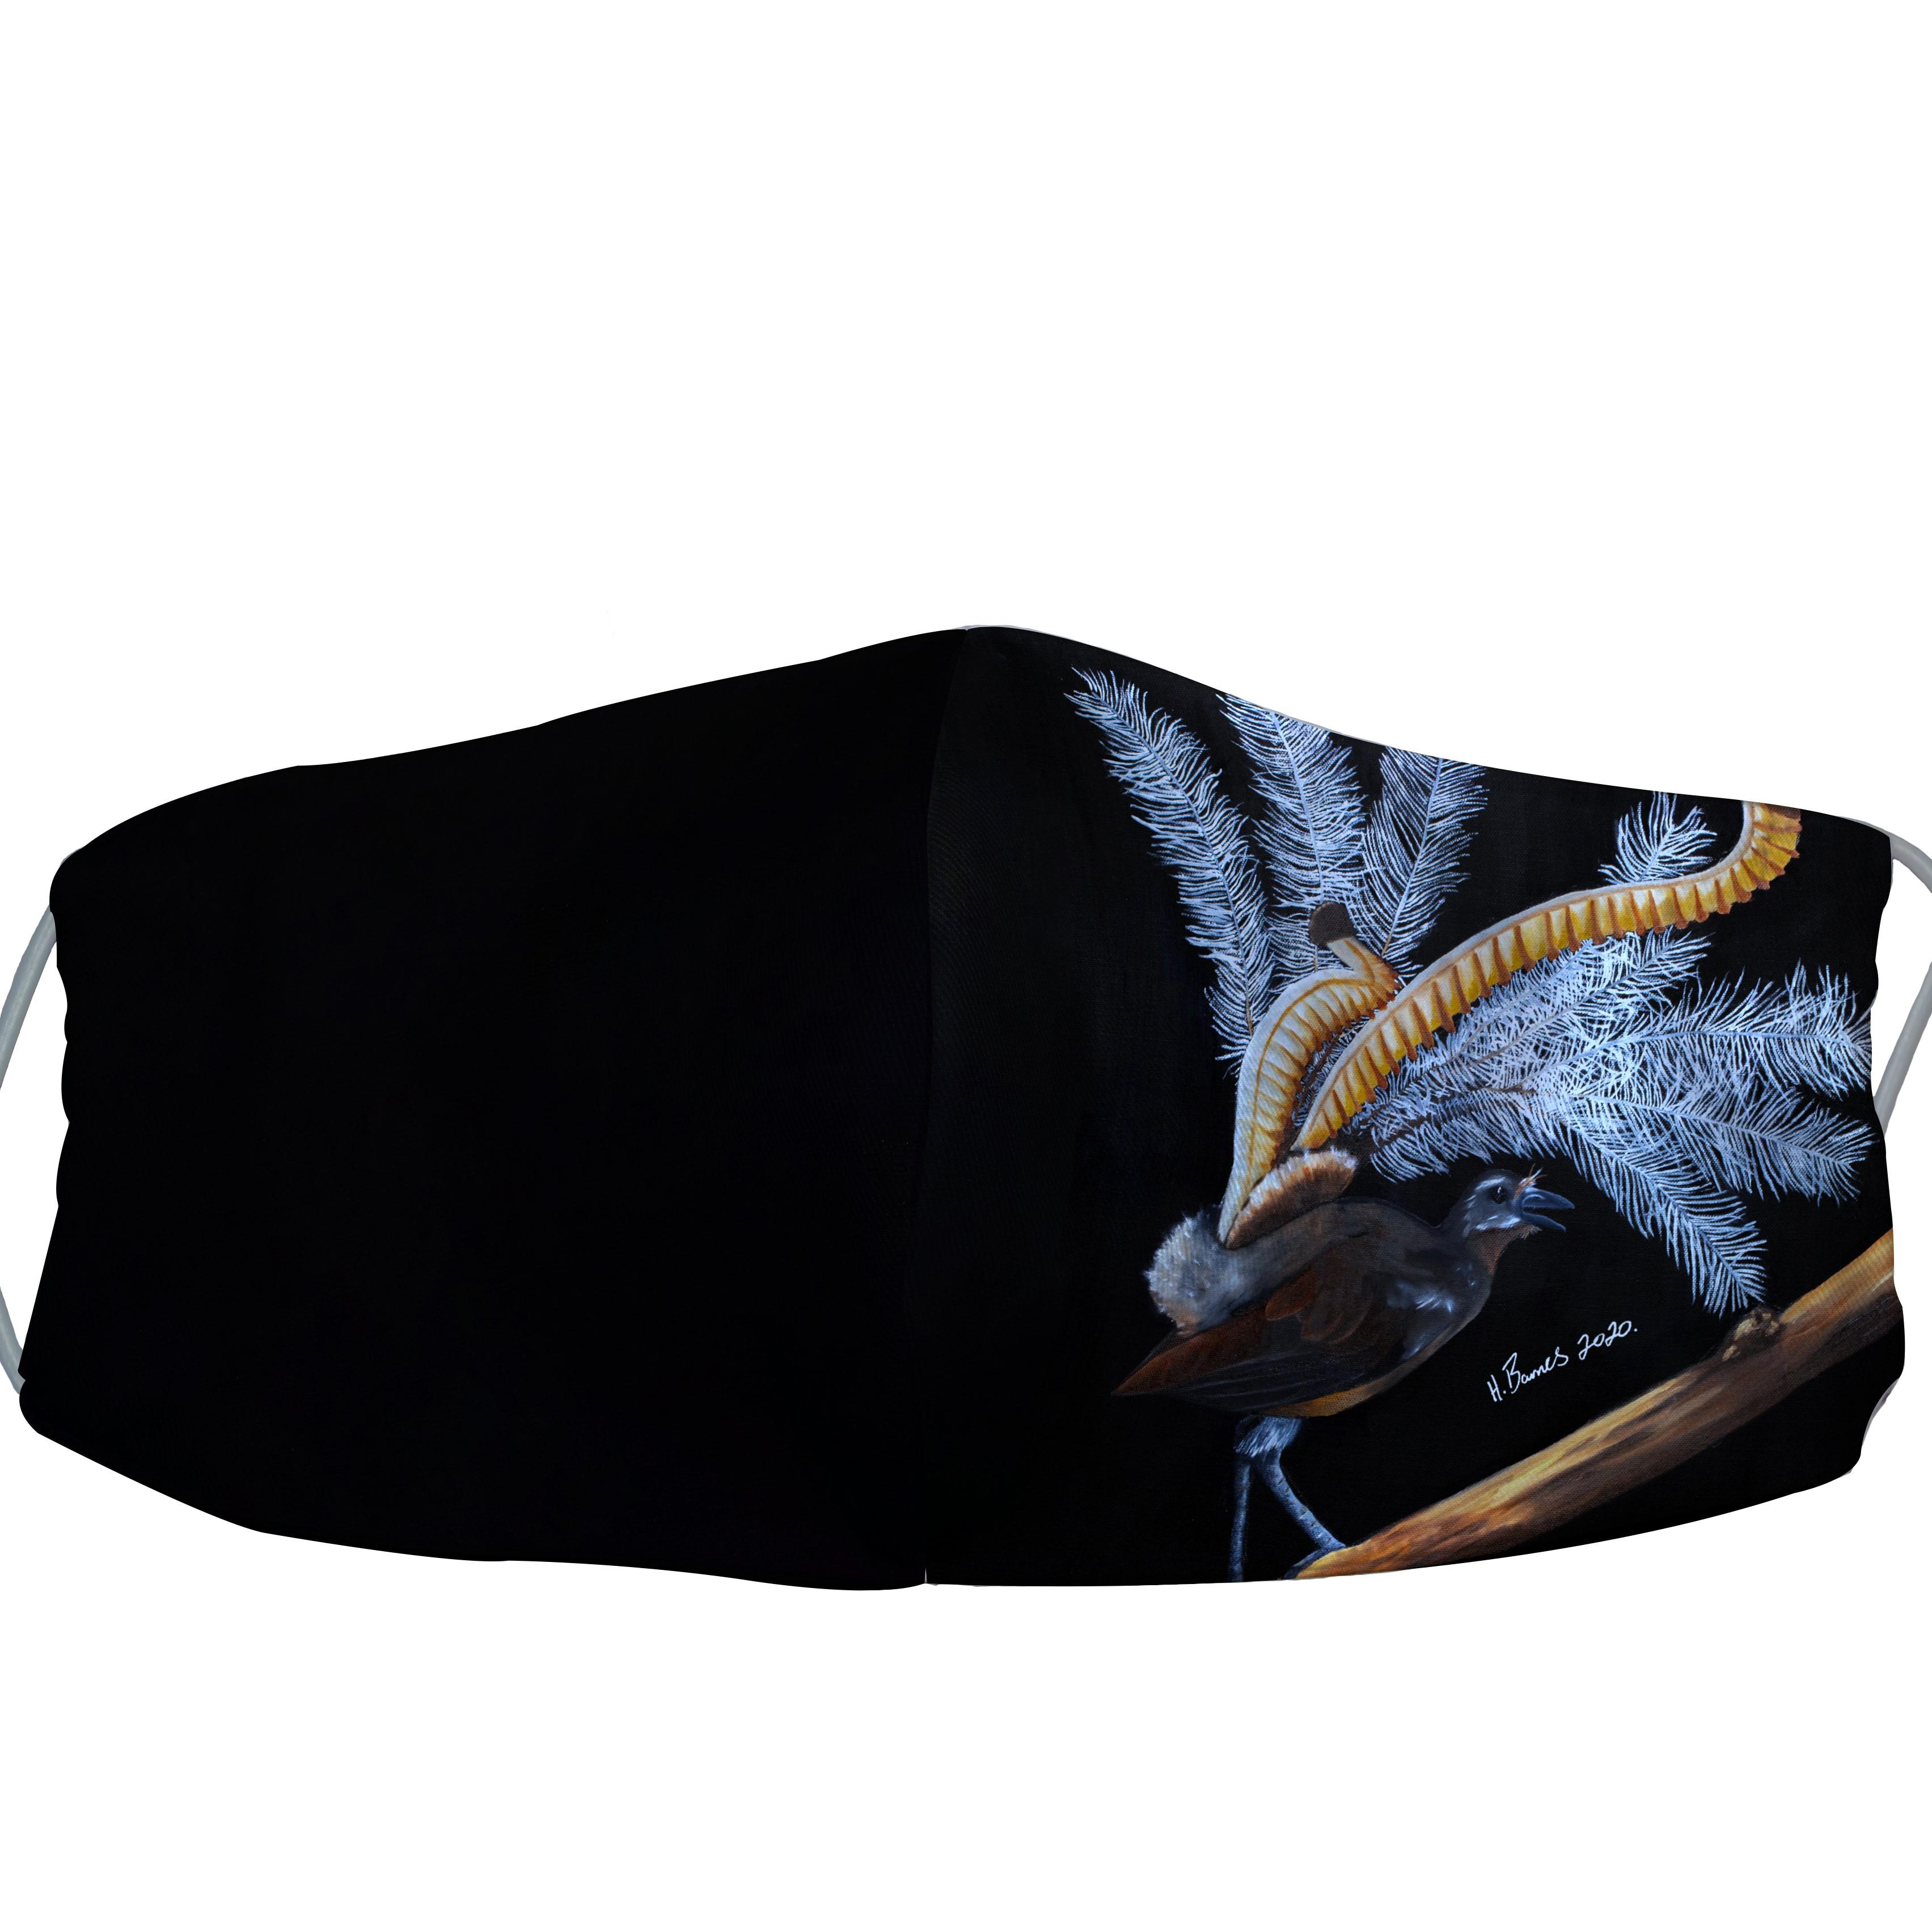 SOLD OUT - Native Lyrebird - Hunter Barnes Facemask